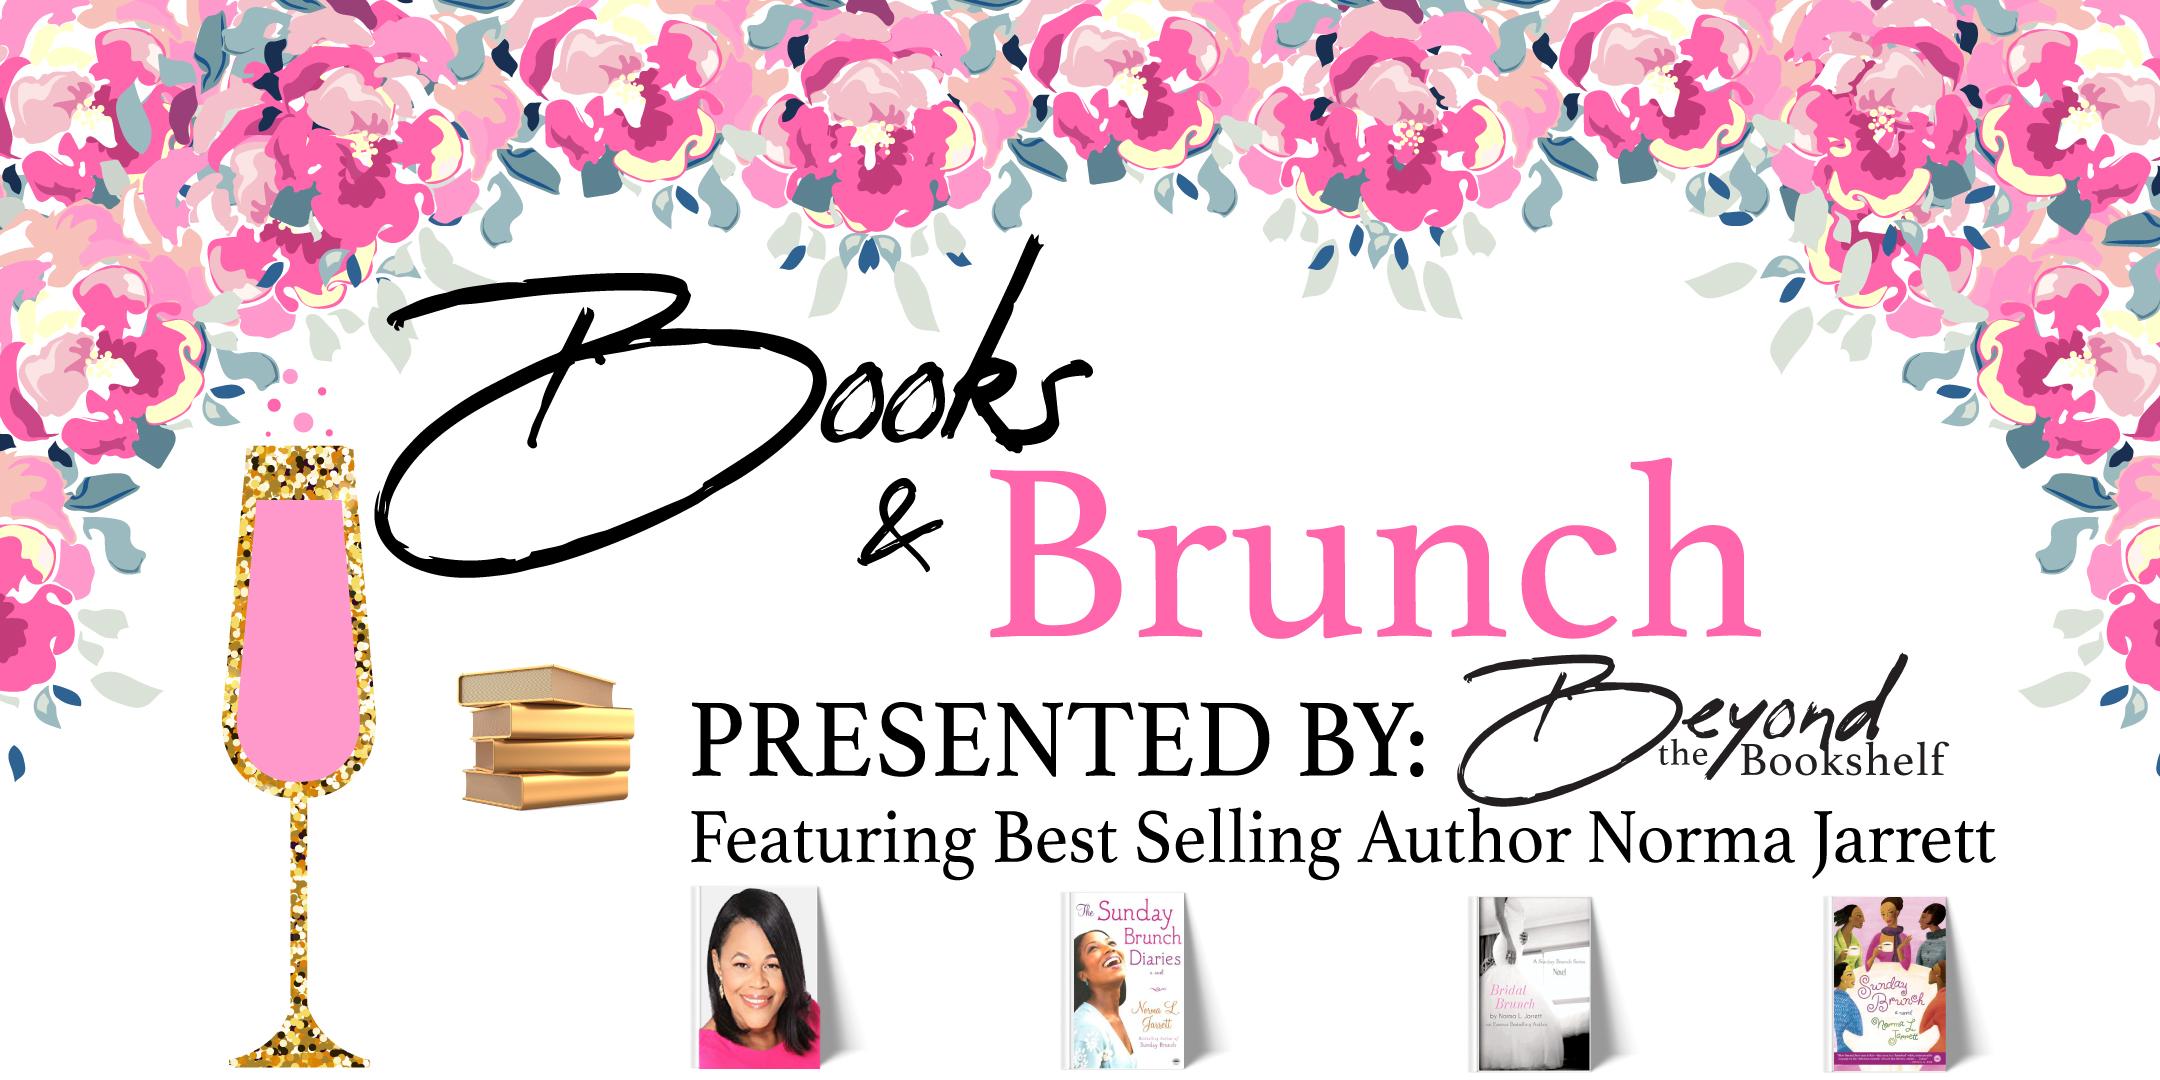 Books-&-Brunch-Eventbrite-.jpg